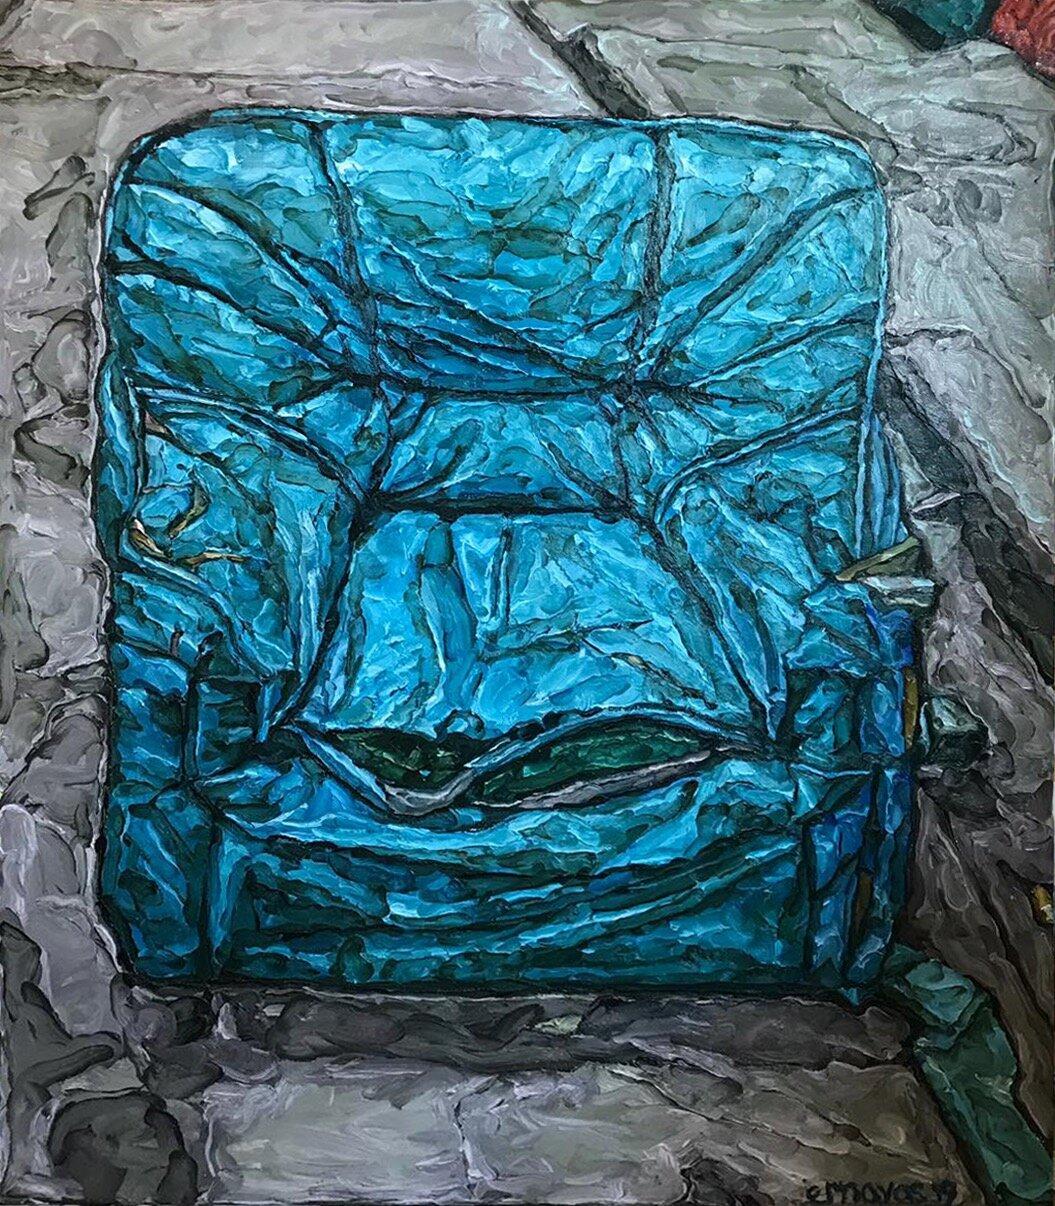 Elaine ROBERTO NAVAS  Sea (After MM Yu)  2019 Oil on canvas H152.4 x W121.9 cm